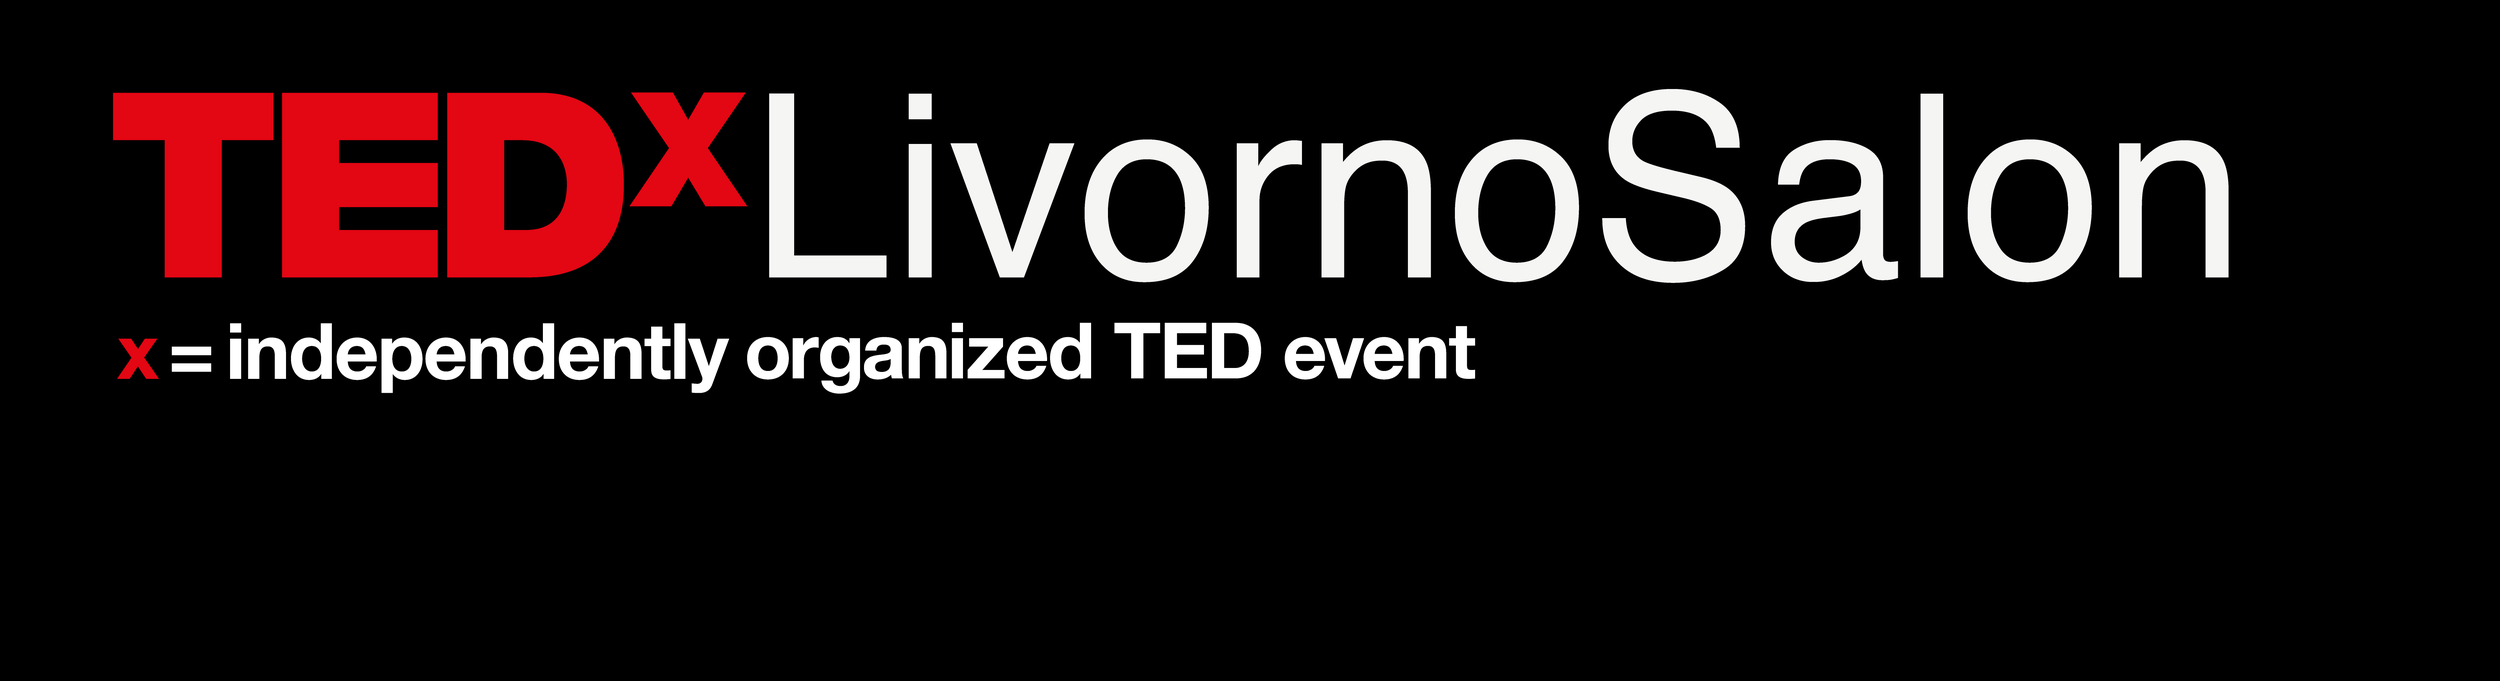 PannelloNero_TEDxLivornoSalon.png